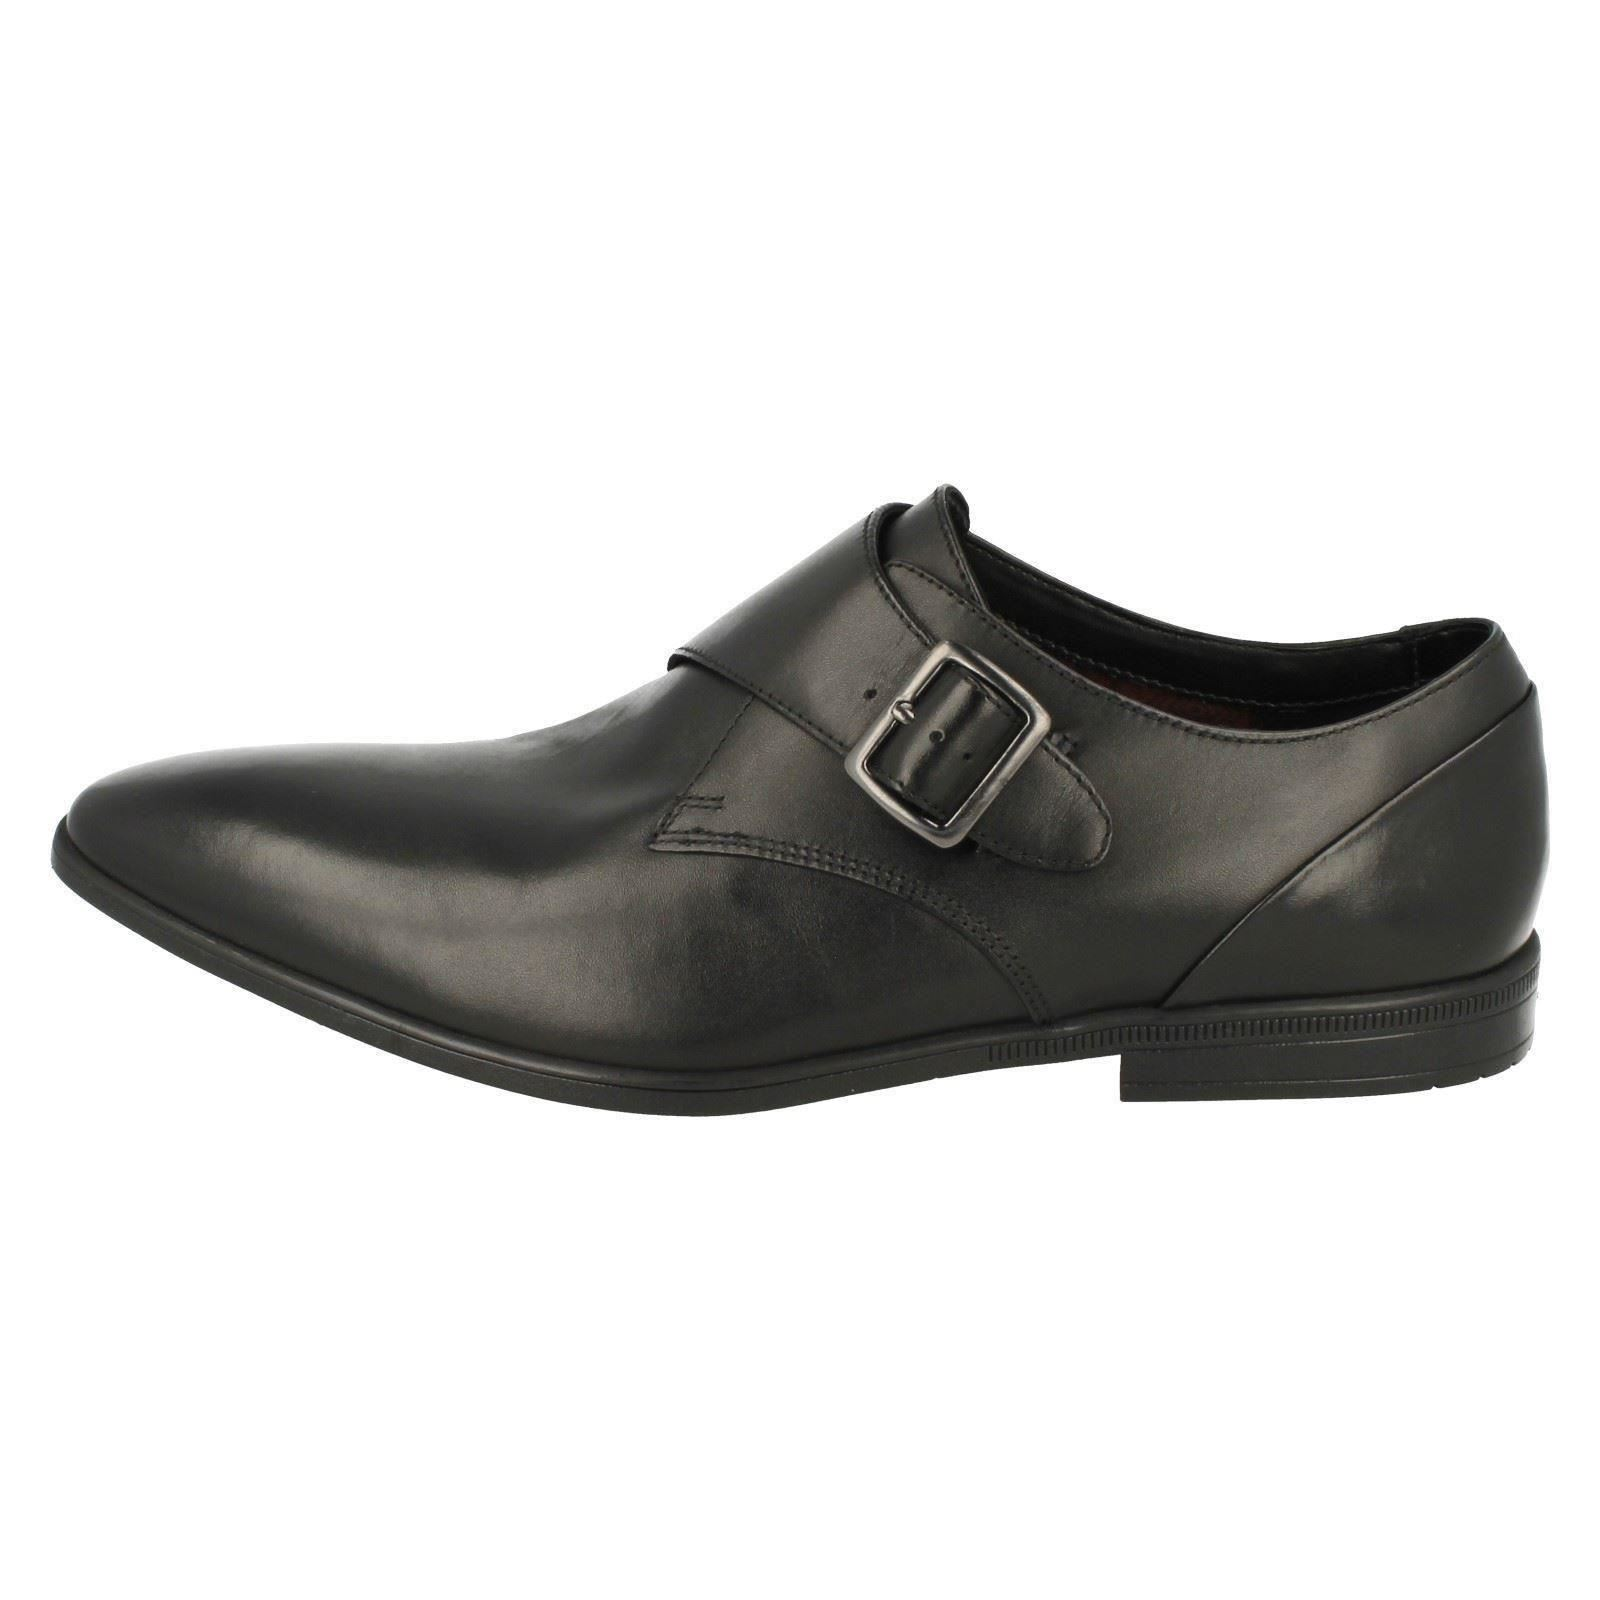 Mens Clarks Bampton Formal Slip On Schuhes Bampton Clarks Work c37279